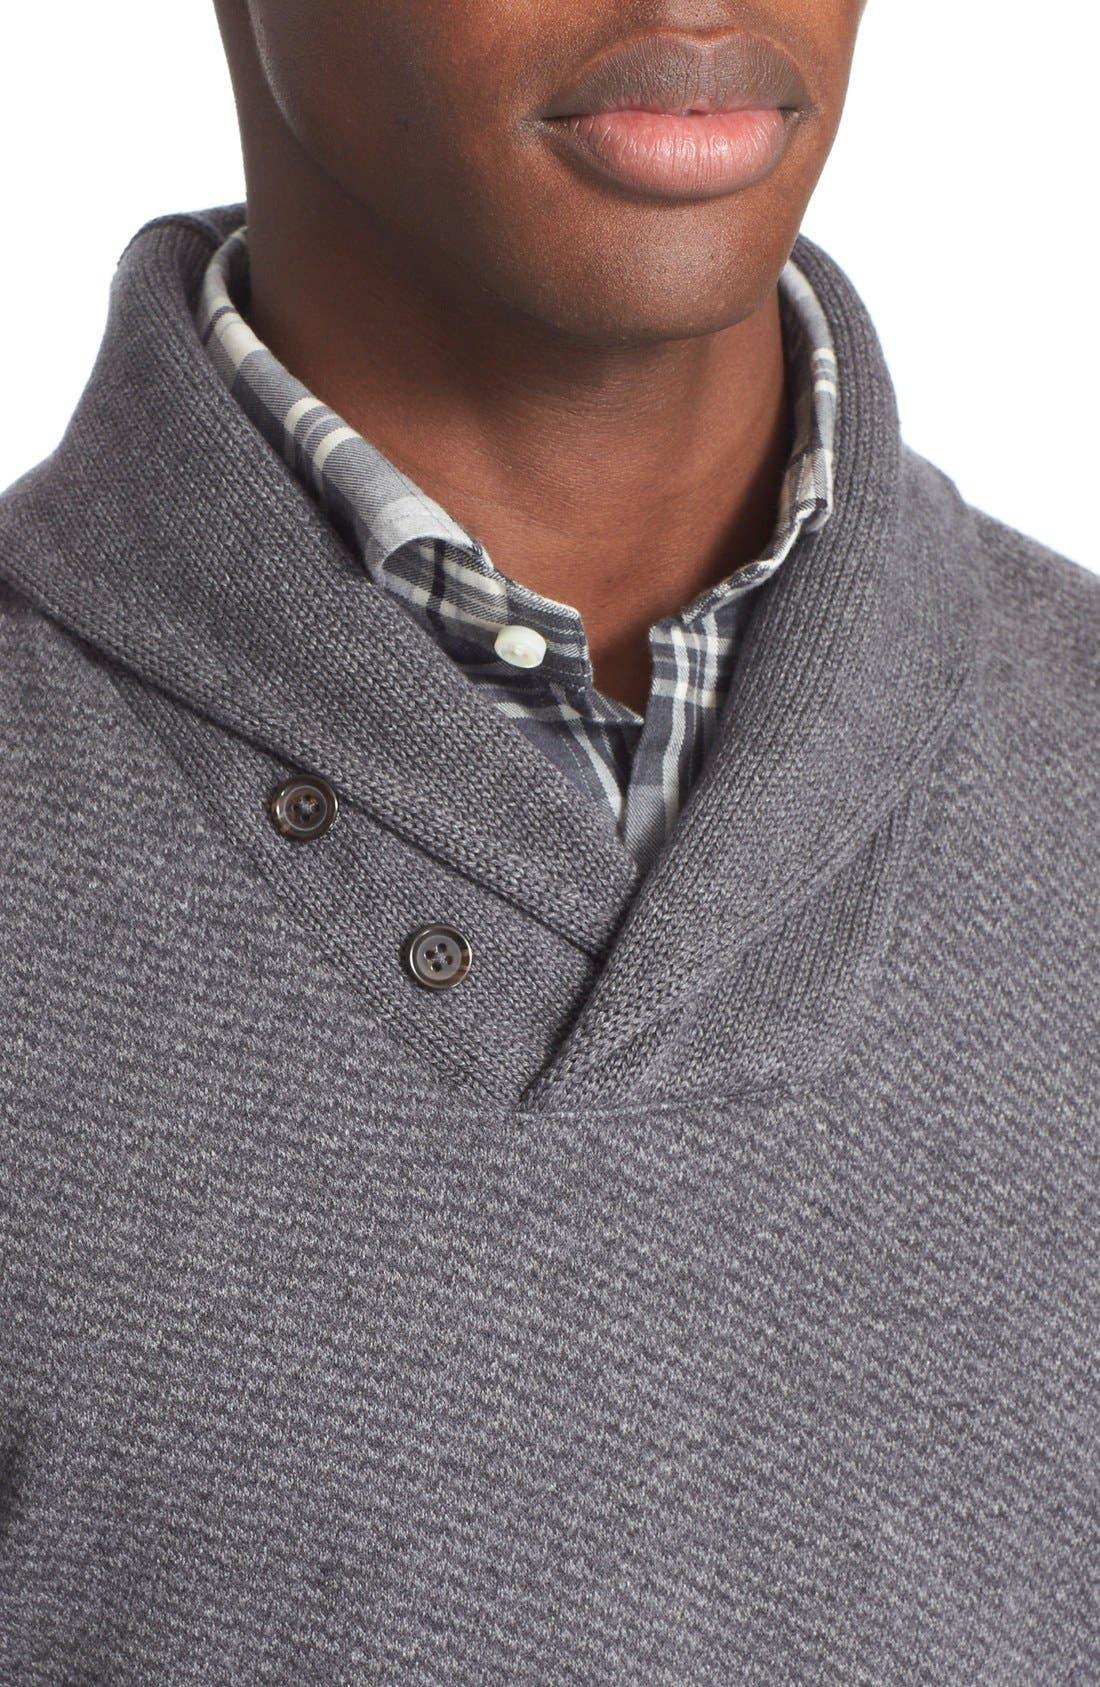 POLO RALPH LAUREN,                             Shawl Collar Sweater,                             Alternate thumbnail 3, color,                             020